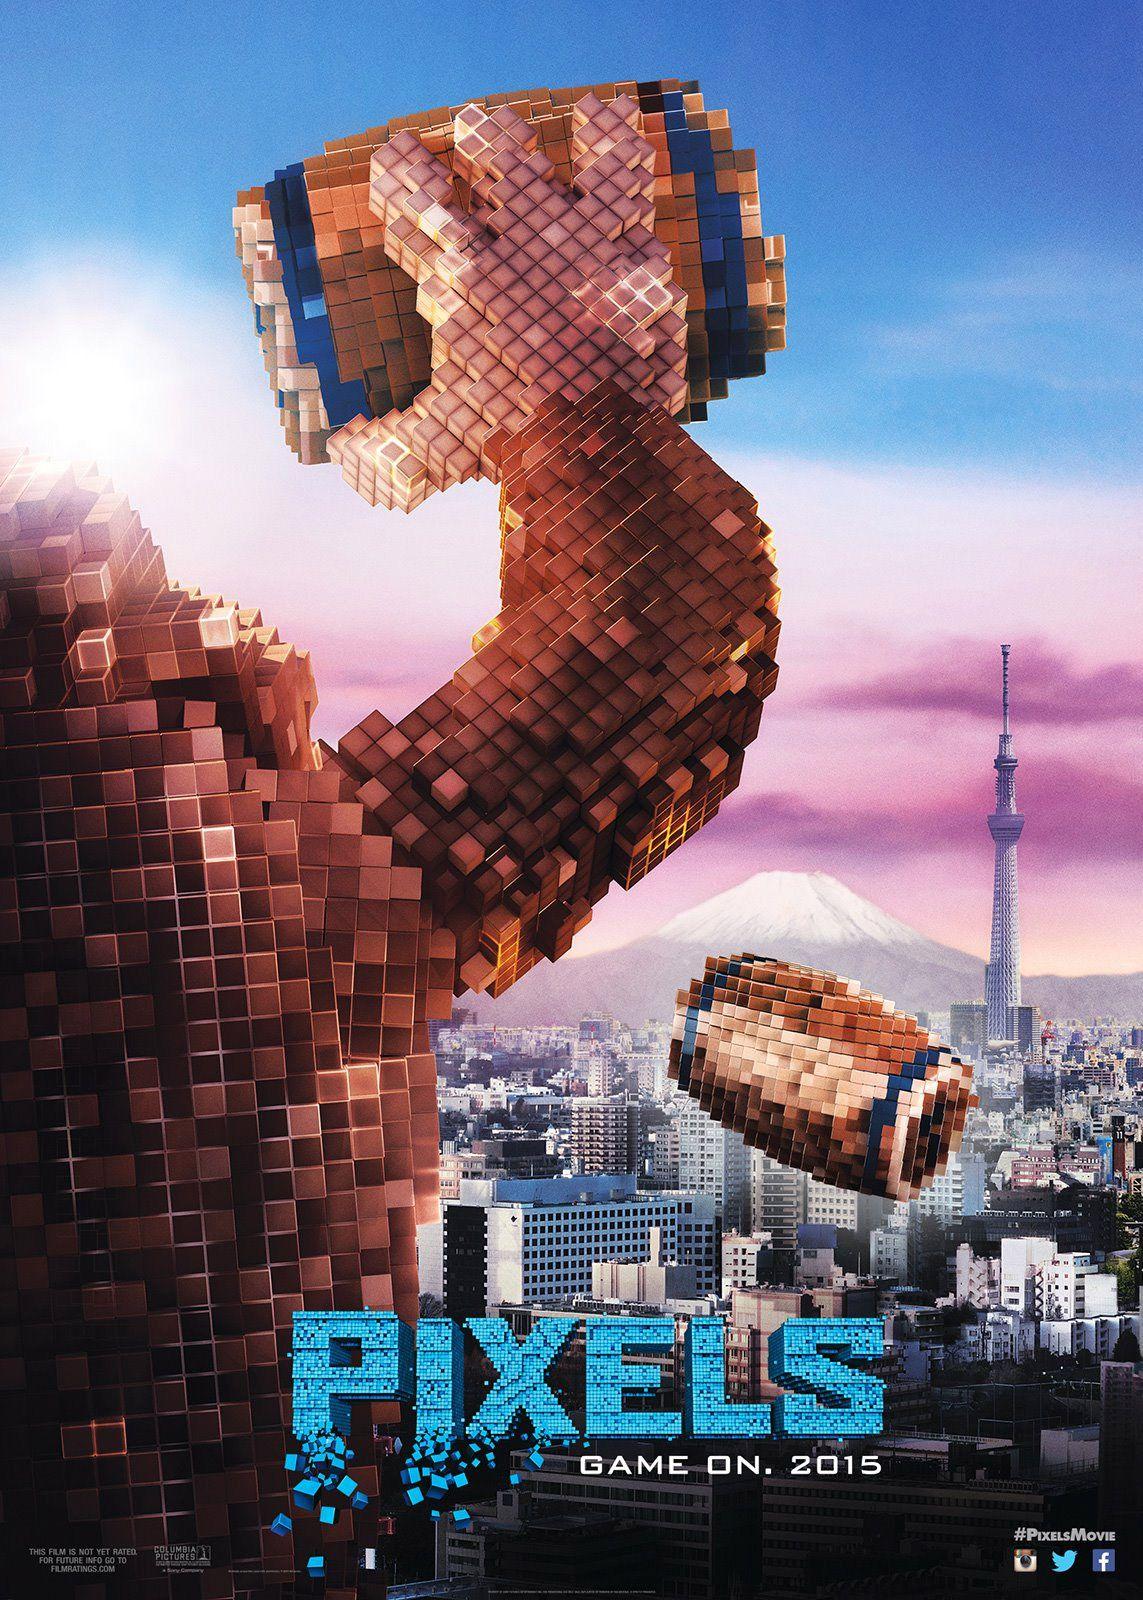 Pixels movie posters